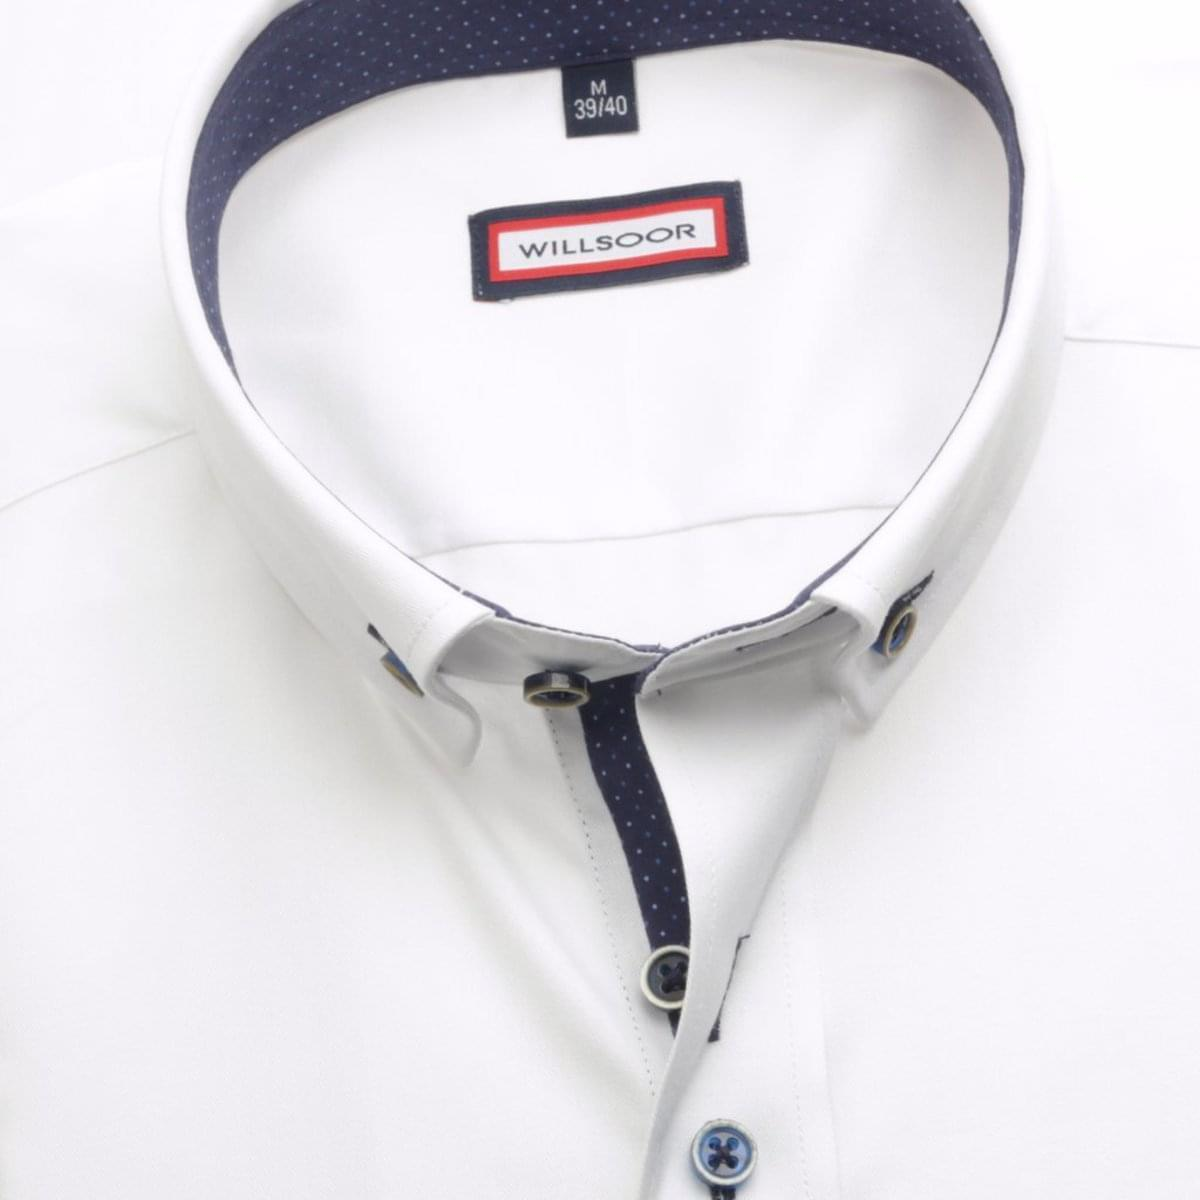 Pánska košele WR Slim Fit (výška 176-182) 5328 176-182 / XL (43/44)